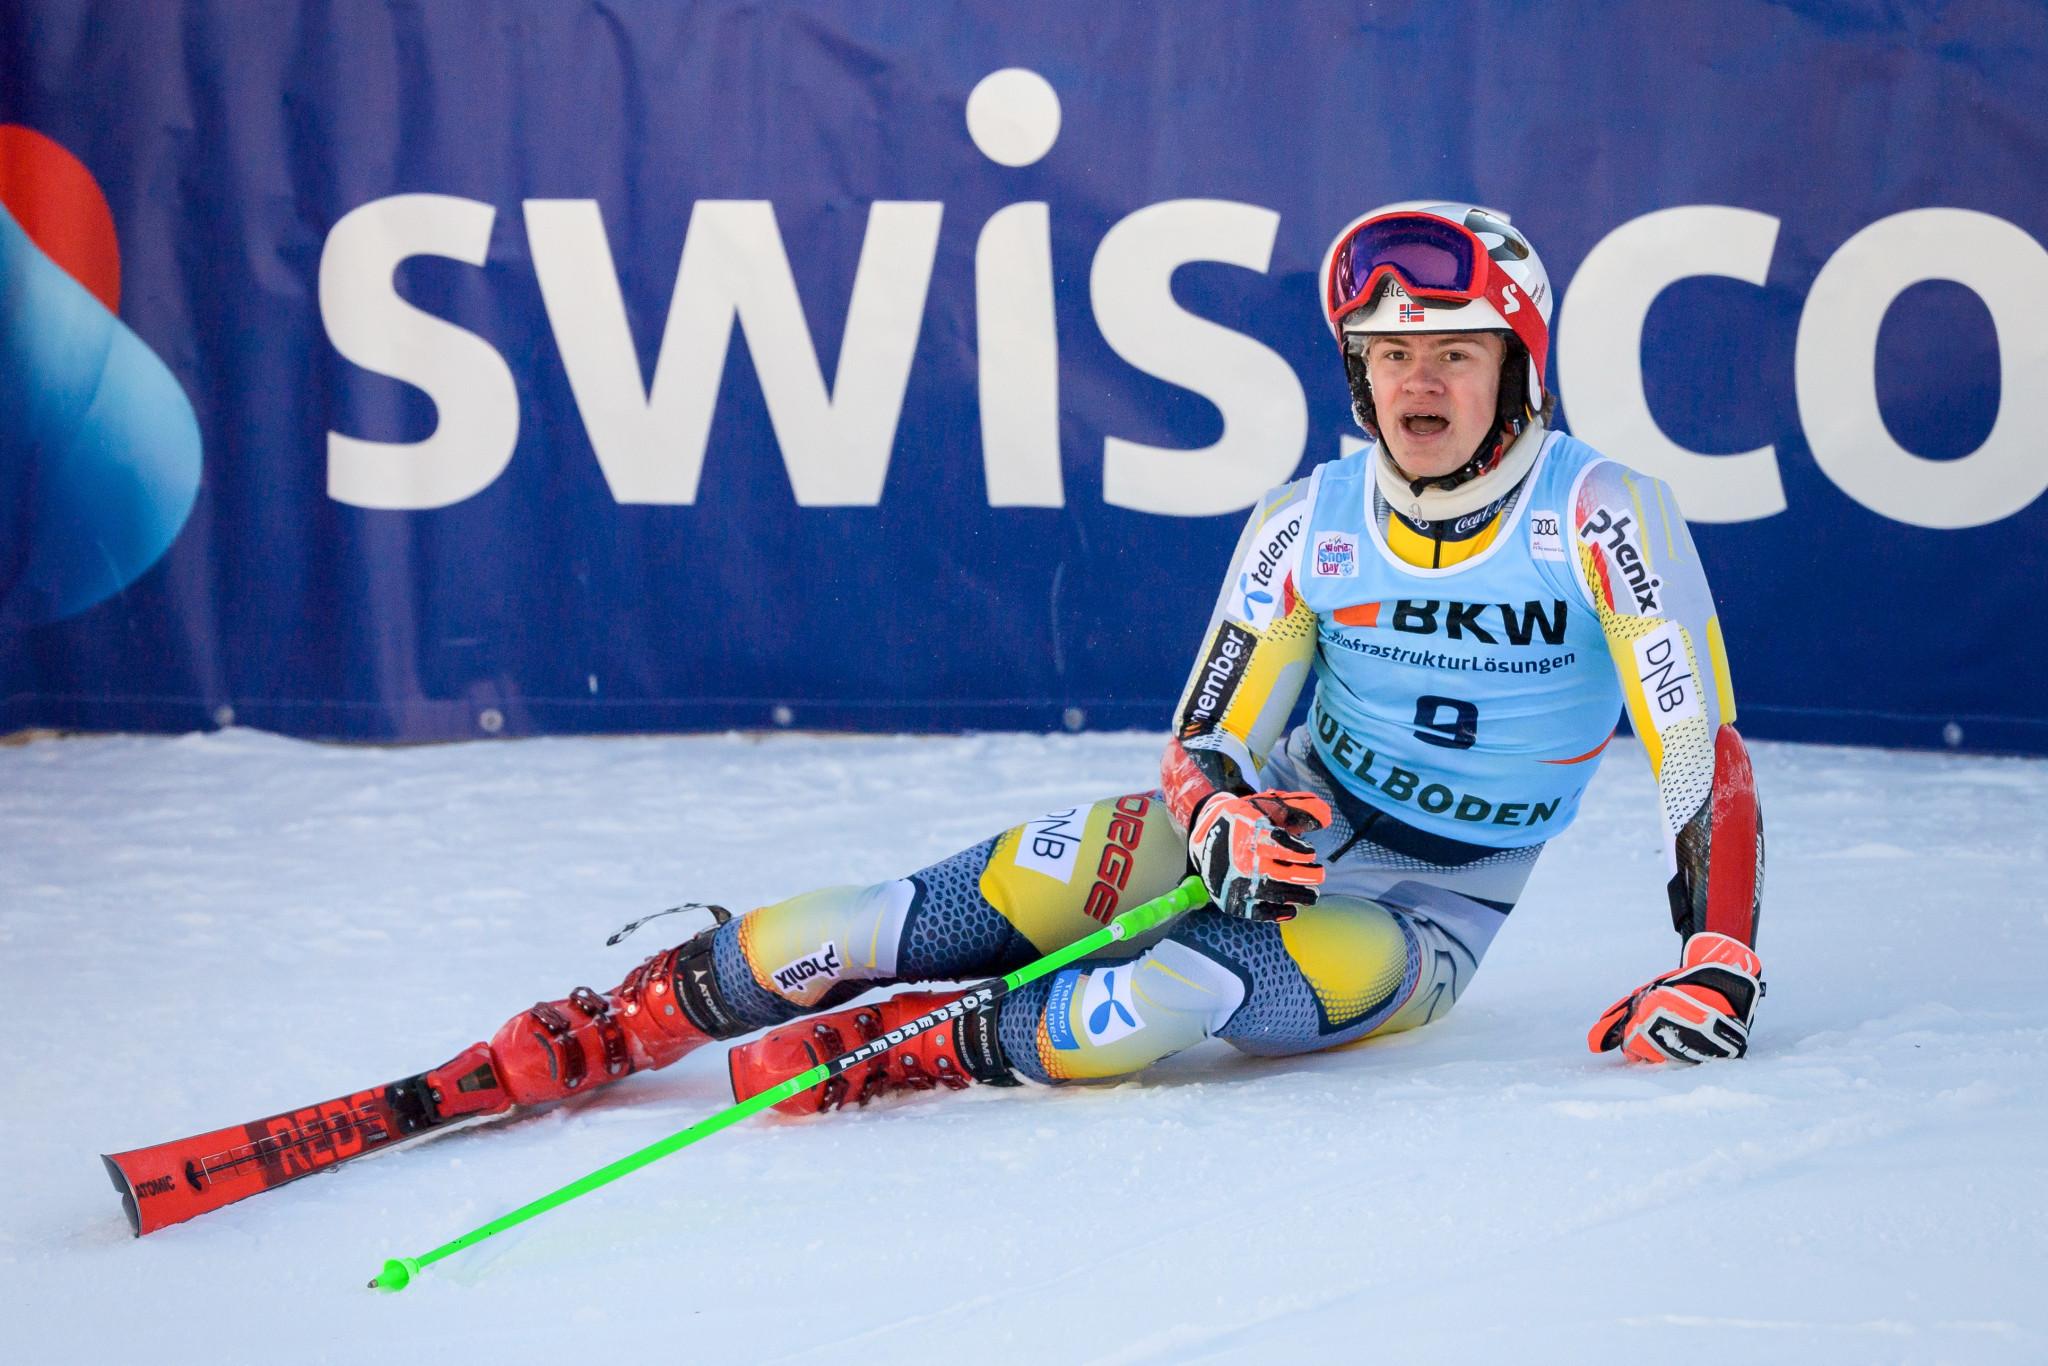 Braathen to miss remainder of FIS Alpine World Cup season with knee injury